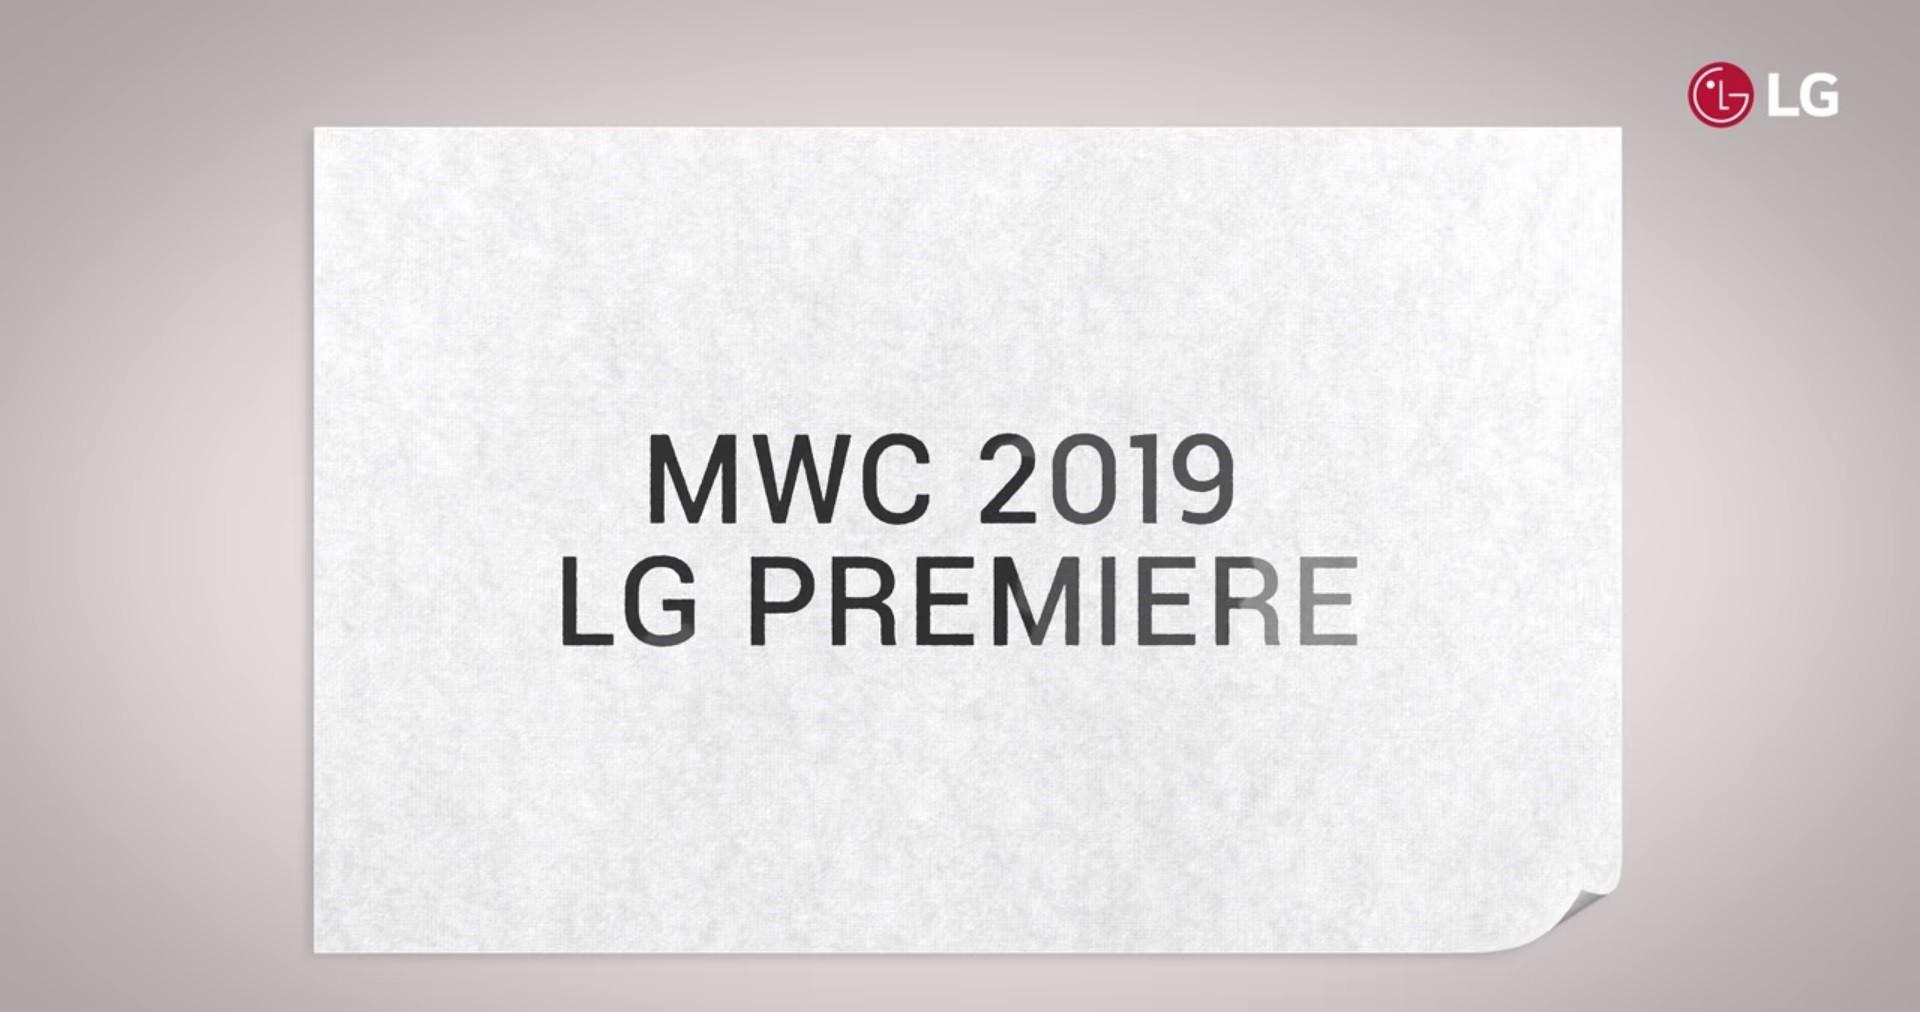 MWC 2019 LG PREMIERE